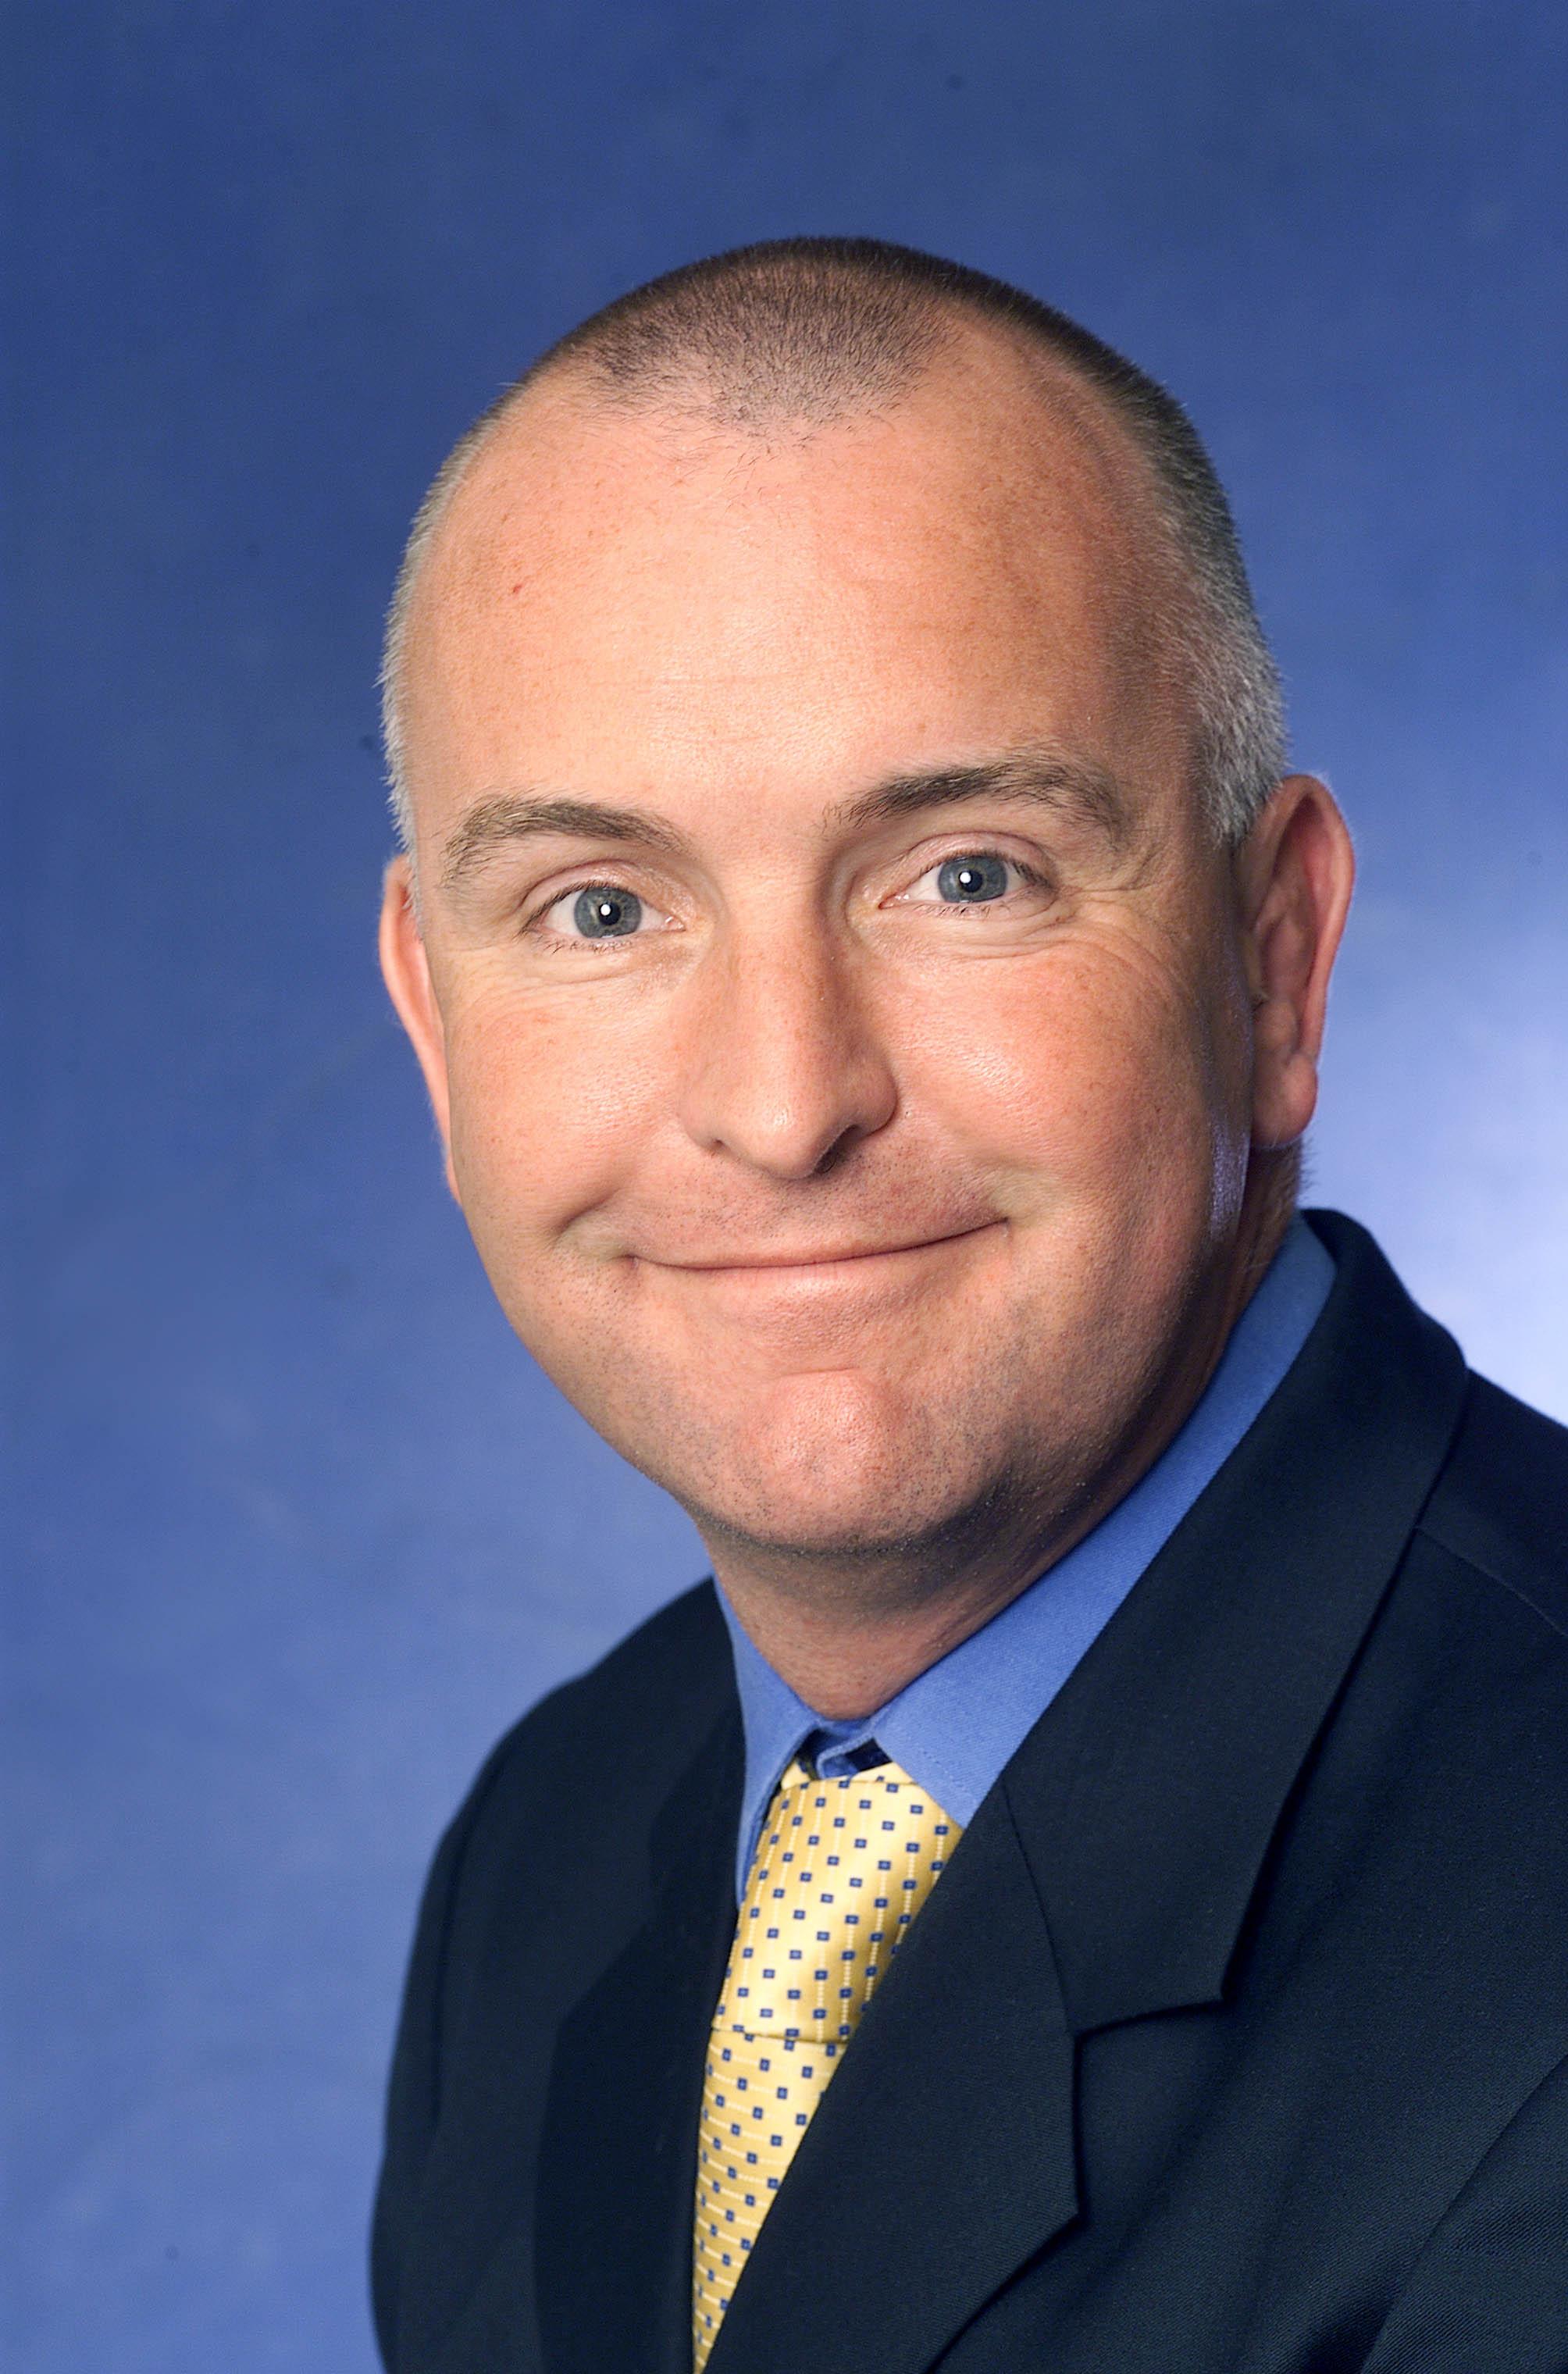 Nick Hawkins, managing director EMEA at Everbridge